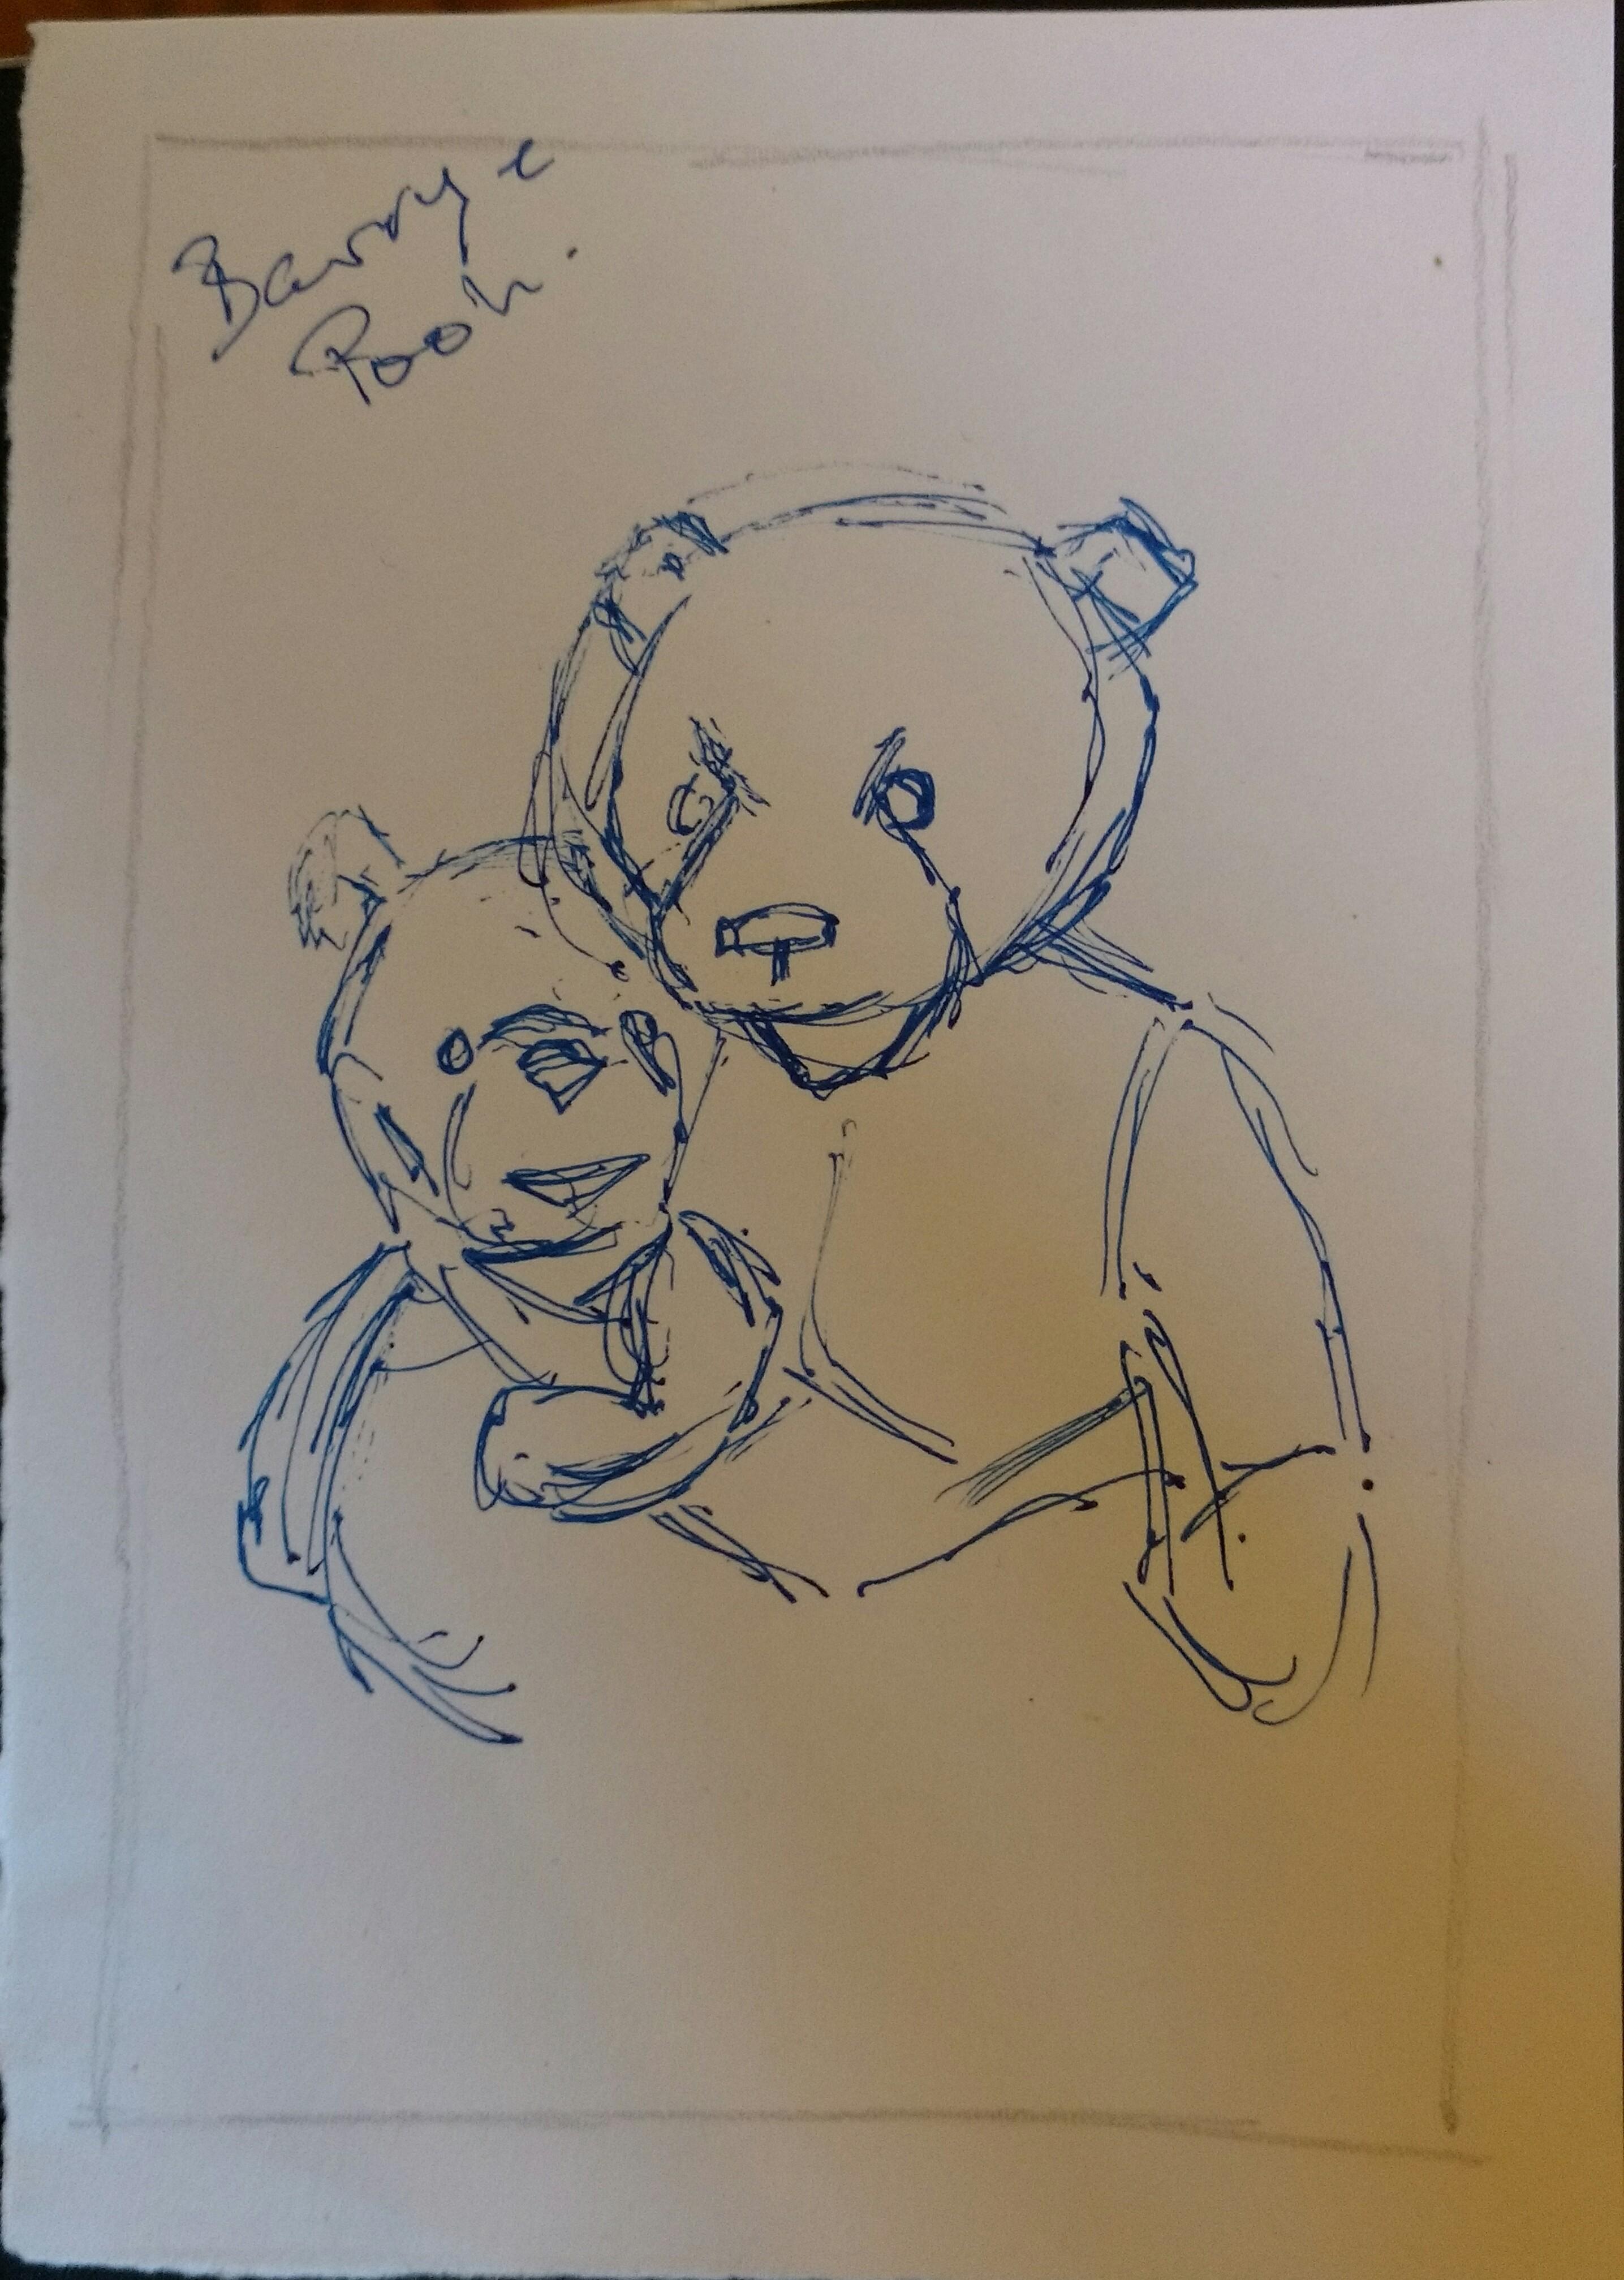 Barry & Pooh